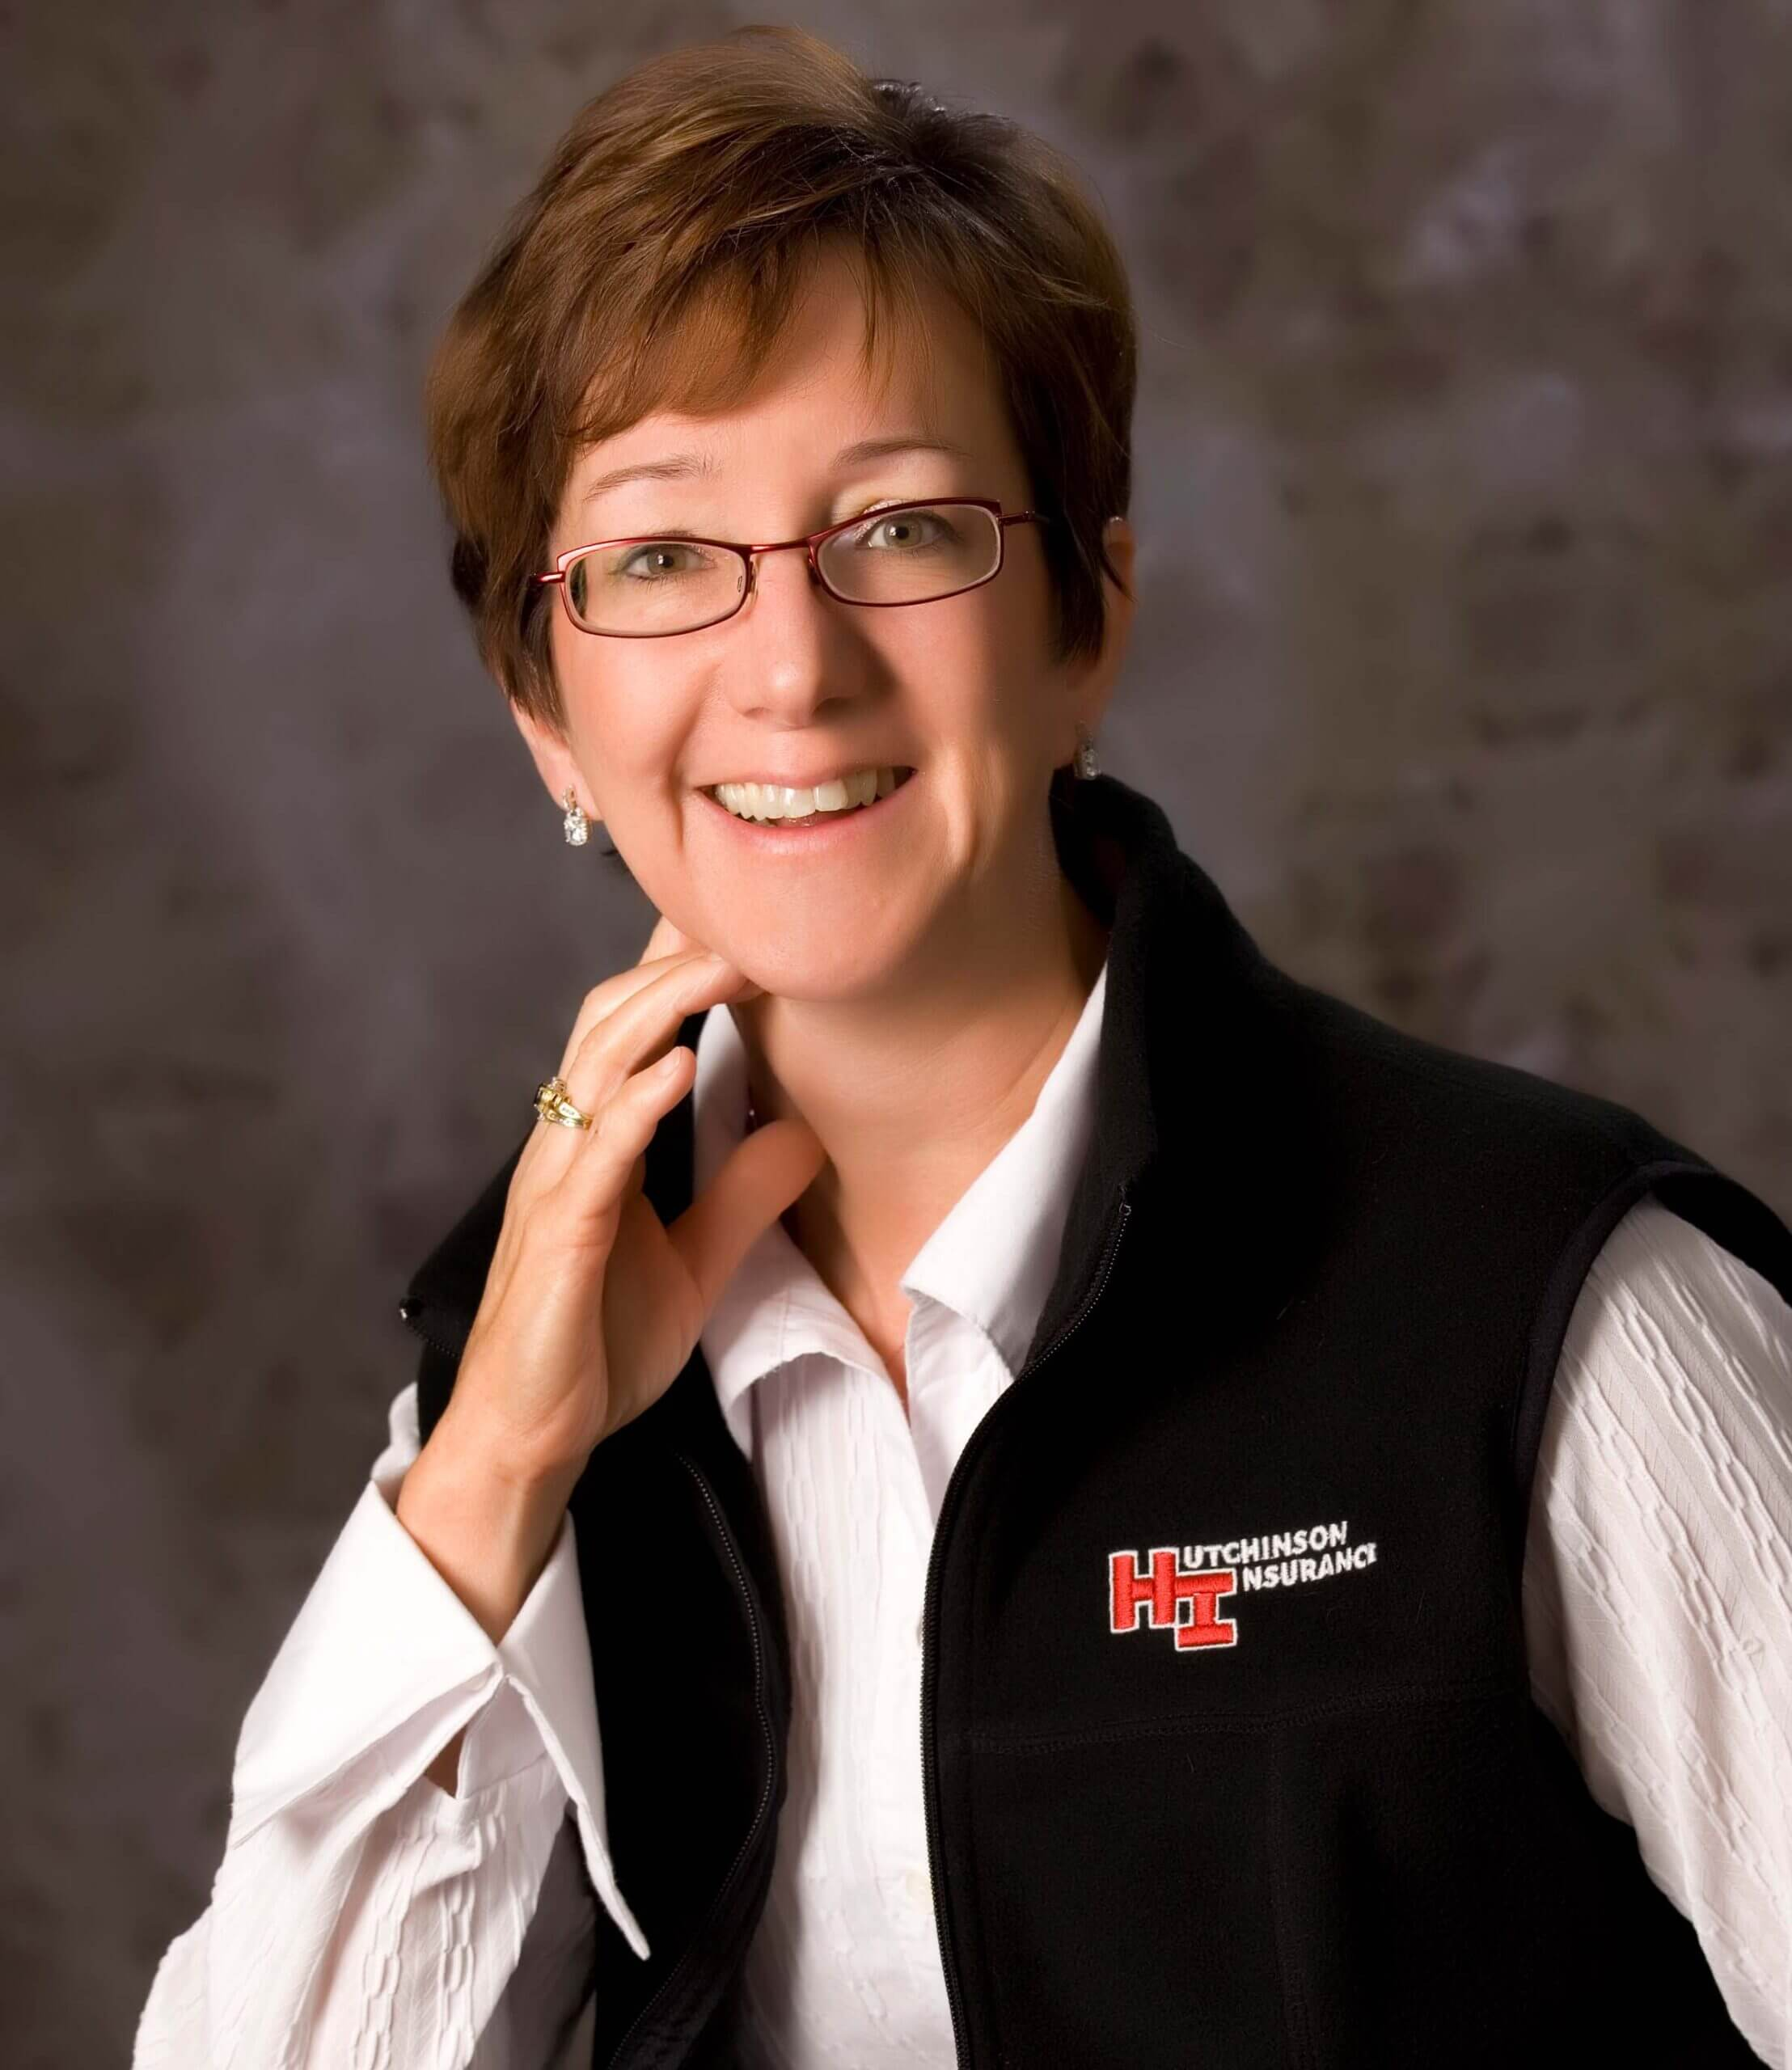 Wendy - Hutchinson Insurance